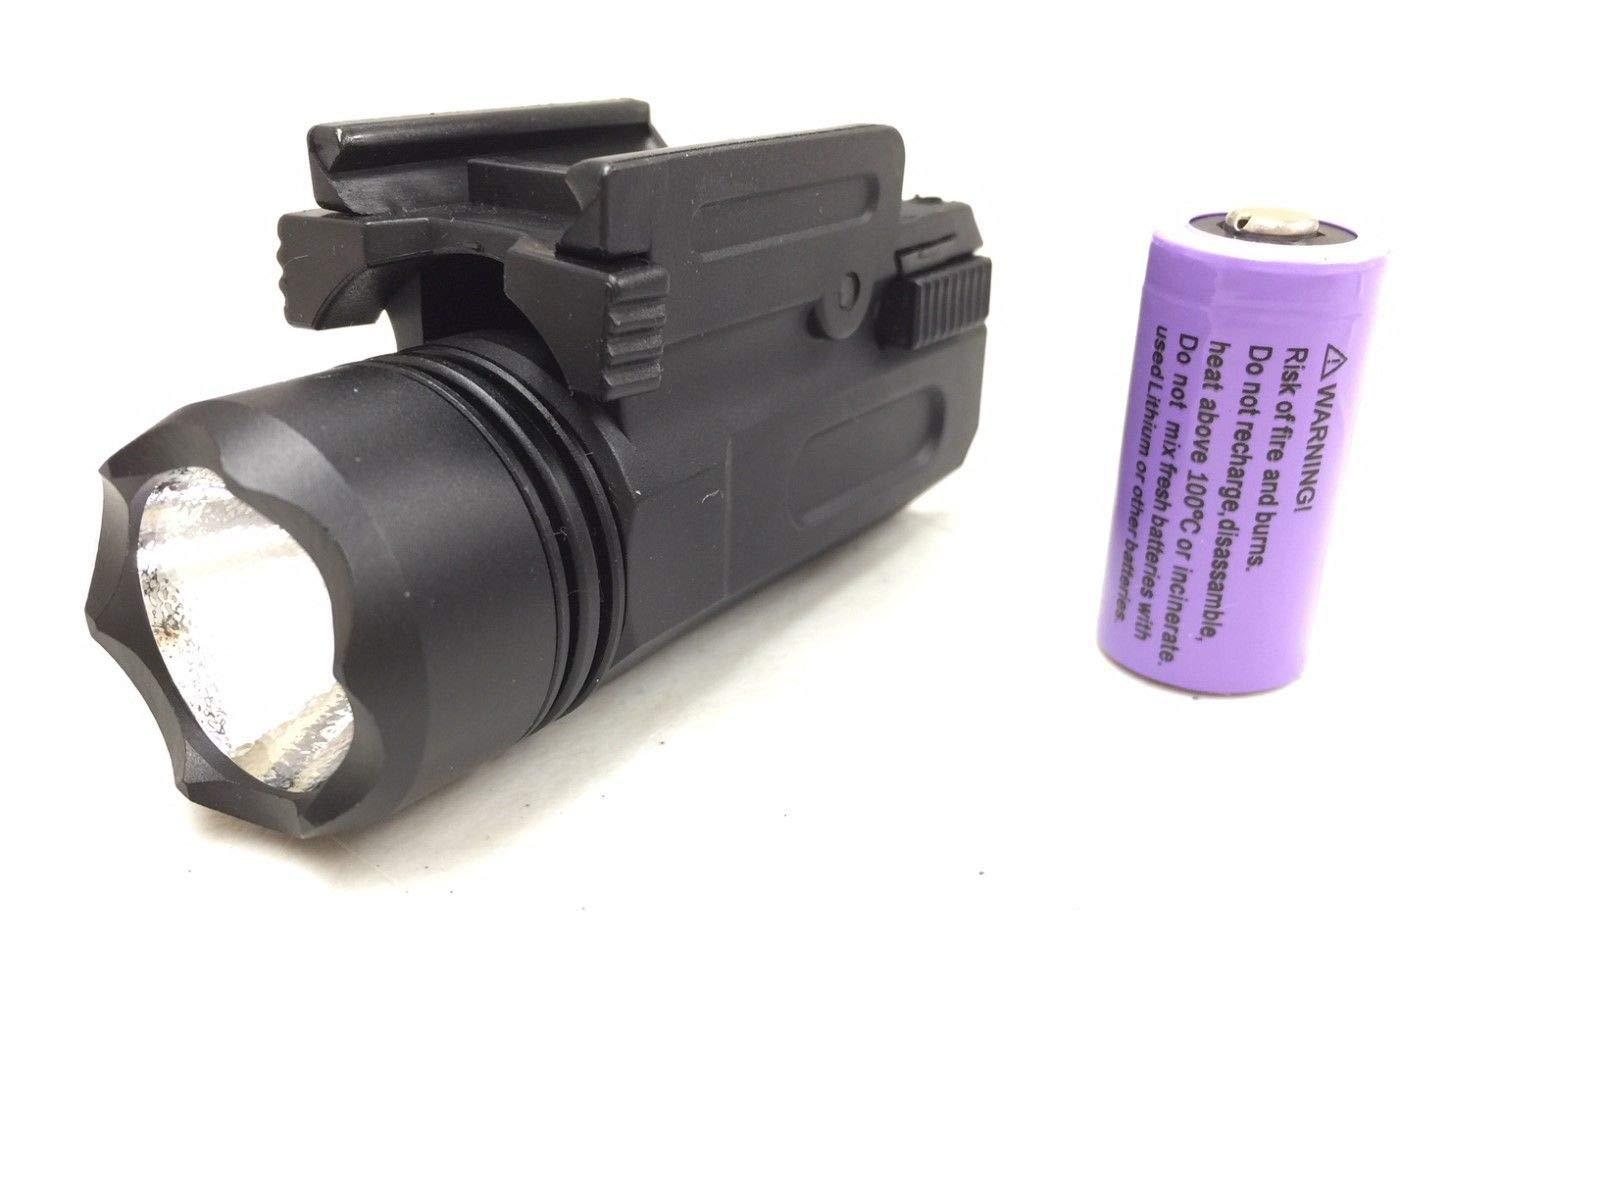 Fire Thunder Quick Release Tactical 180 Lumen Led Powered Pistol Flashlight Light